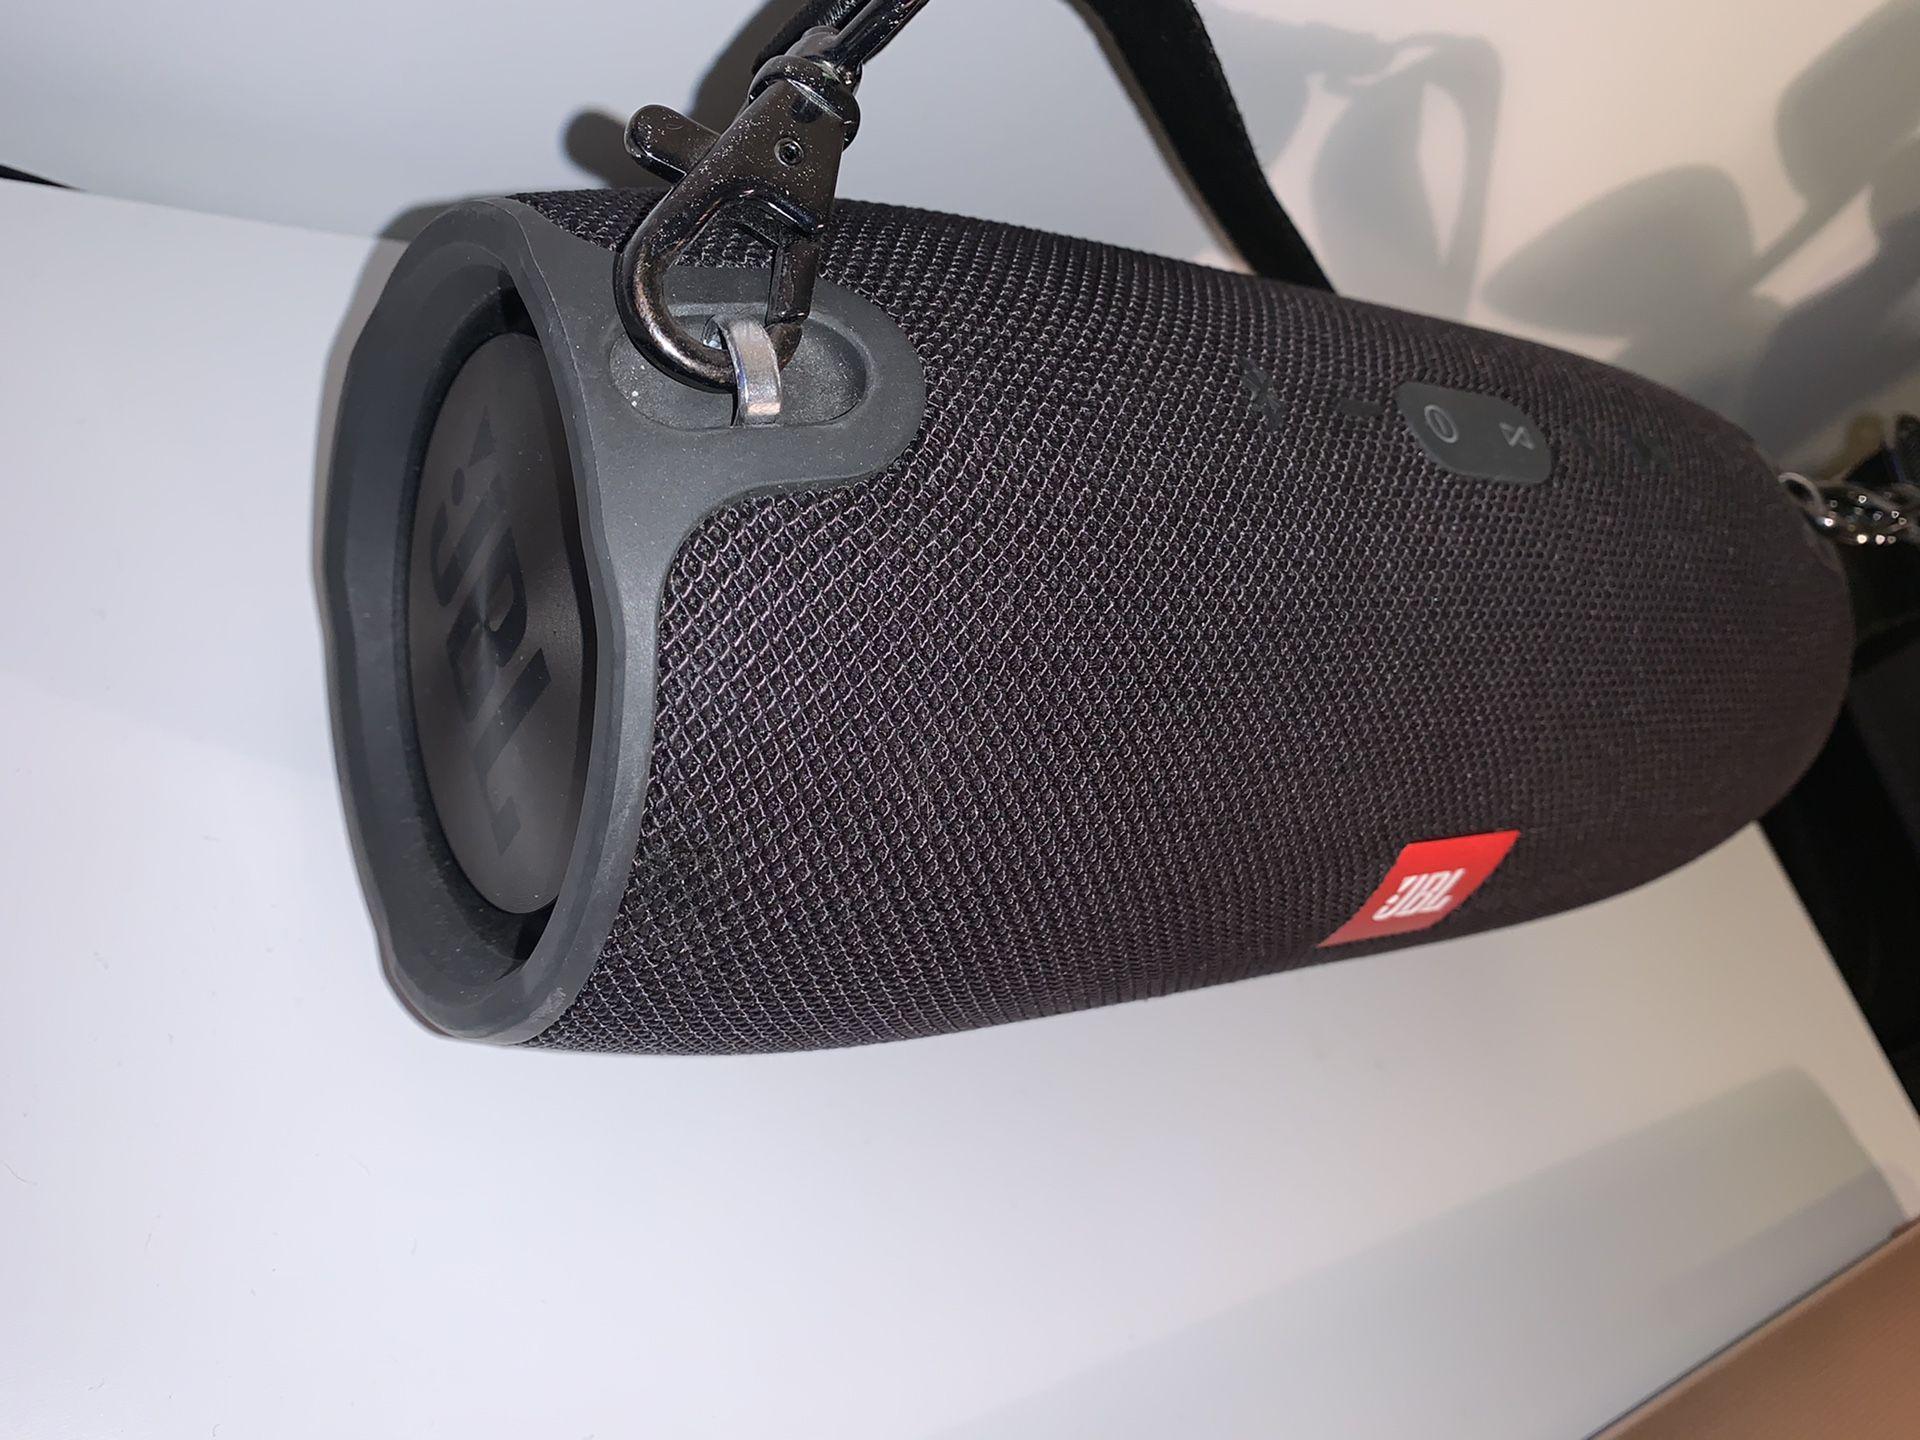 JBL Xtreme Speakers